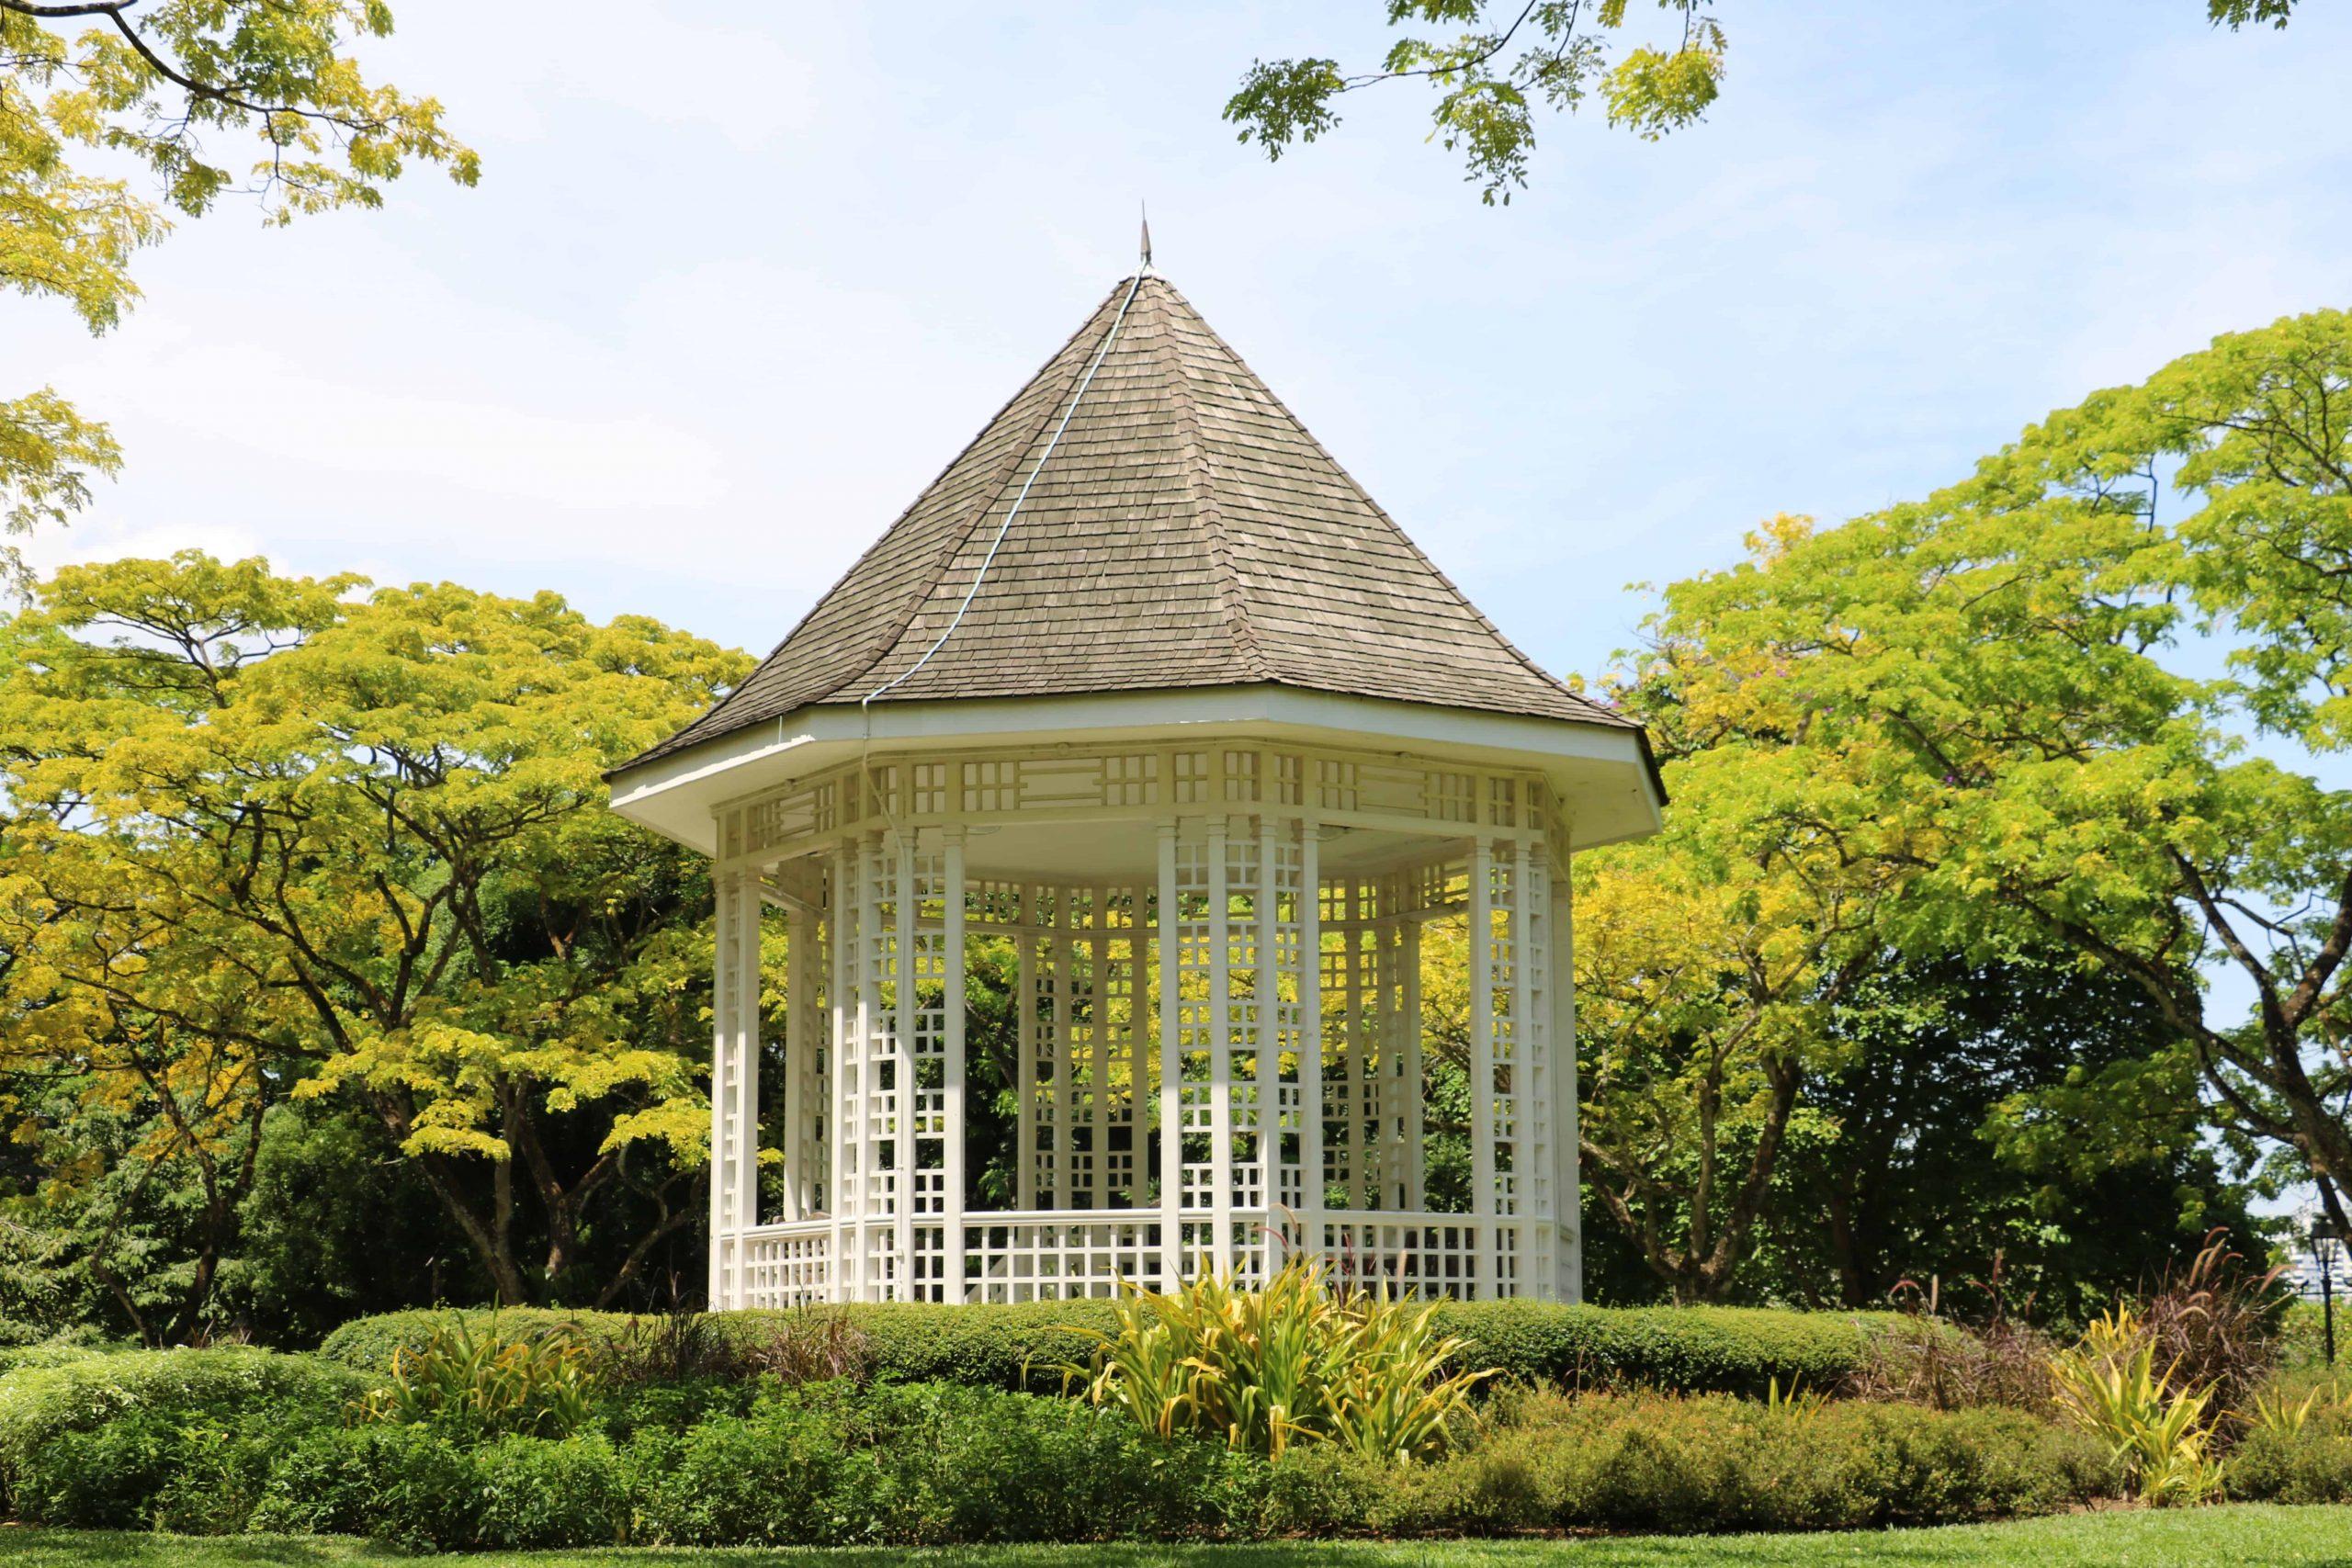 Full Size of Gartenpavillon Test Empfehlungen 05 20 Gartenbook Garten Pavillon Wohnzimmer Pavillon Eisen